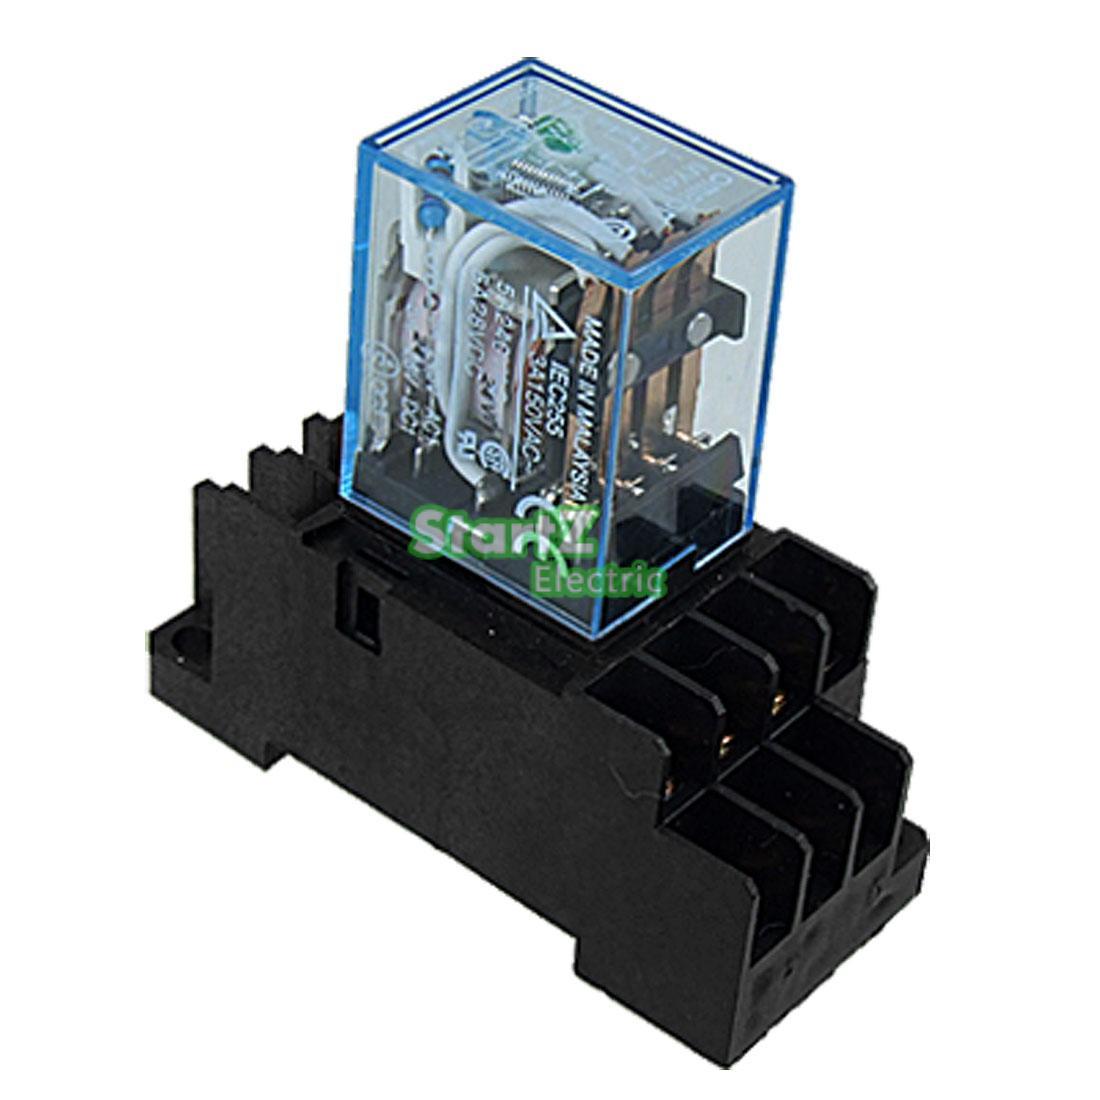 12v relay wiring diagram 6 pin simple respiration aliexpress buy 10pcs omron my4nj 220 240v ac